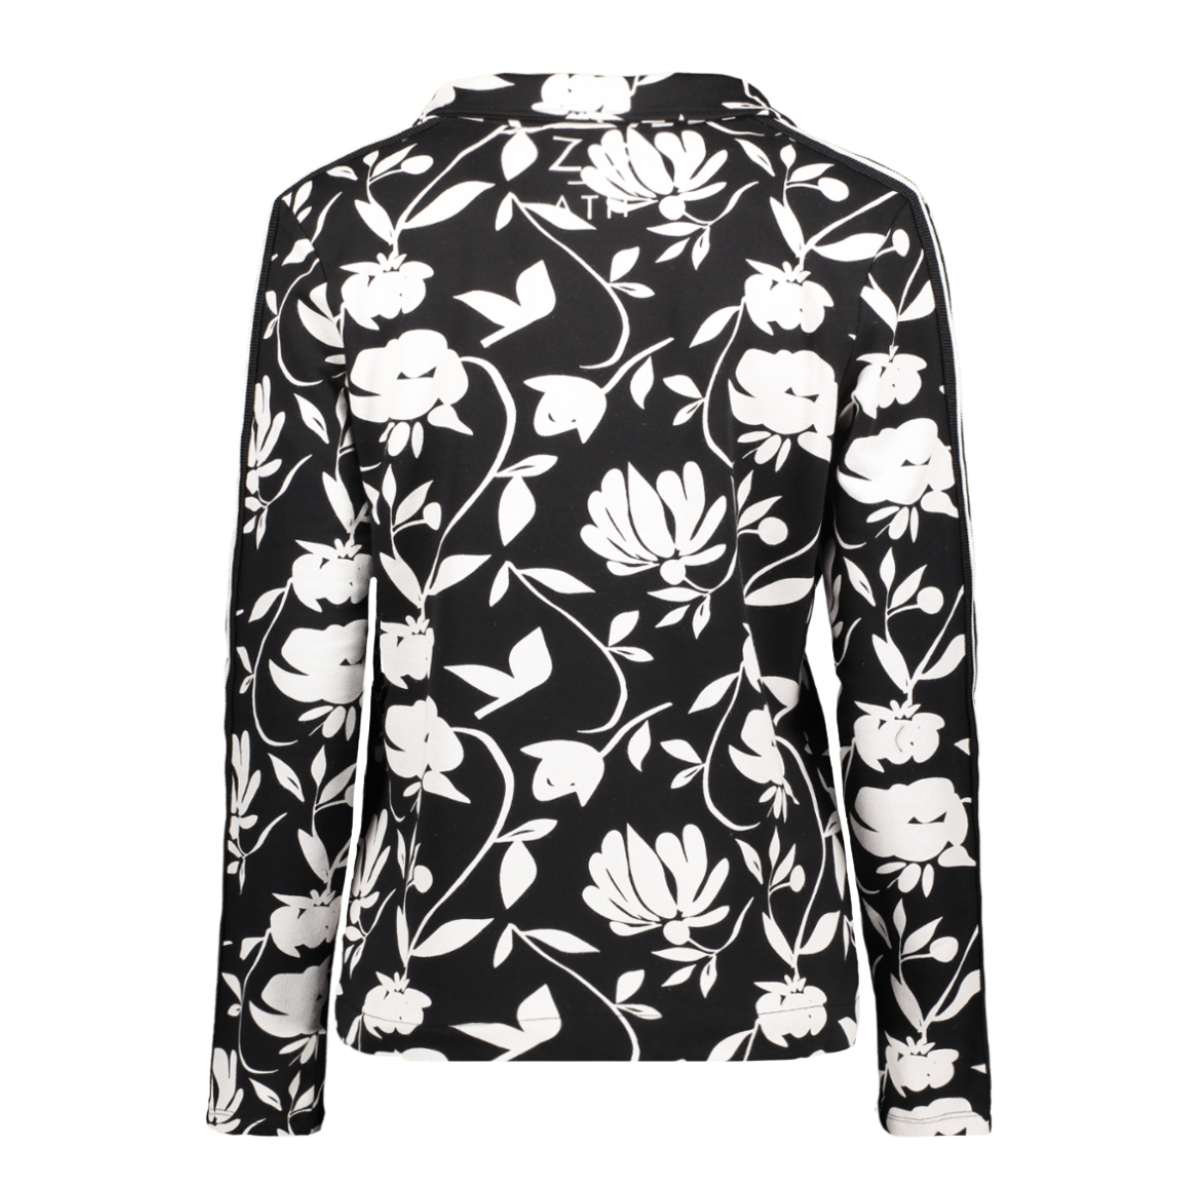 tessa 194  print sweat blazer zoso blazer black/offwhite